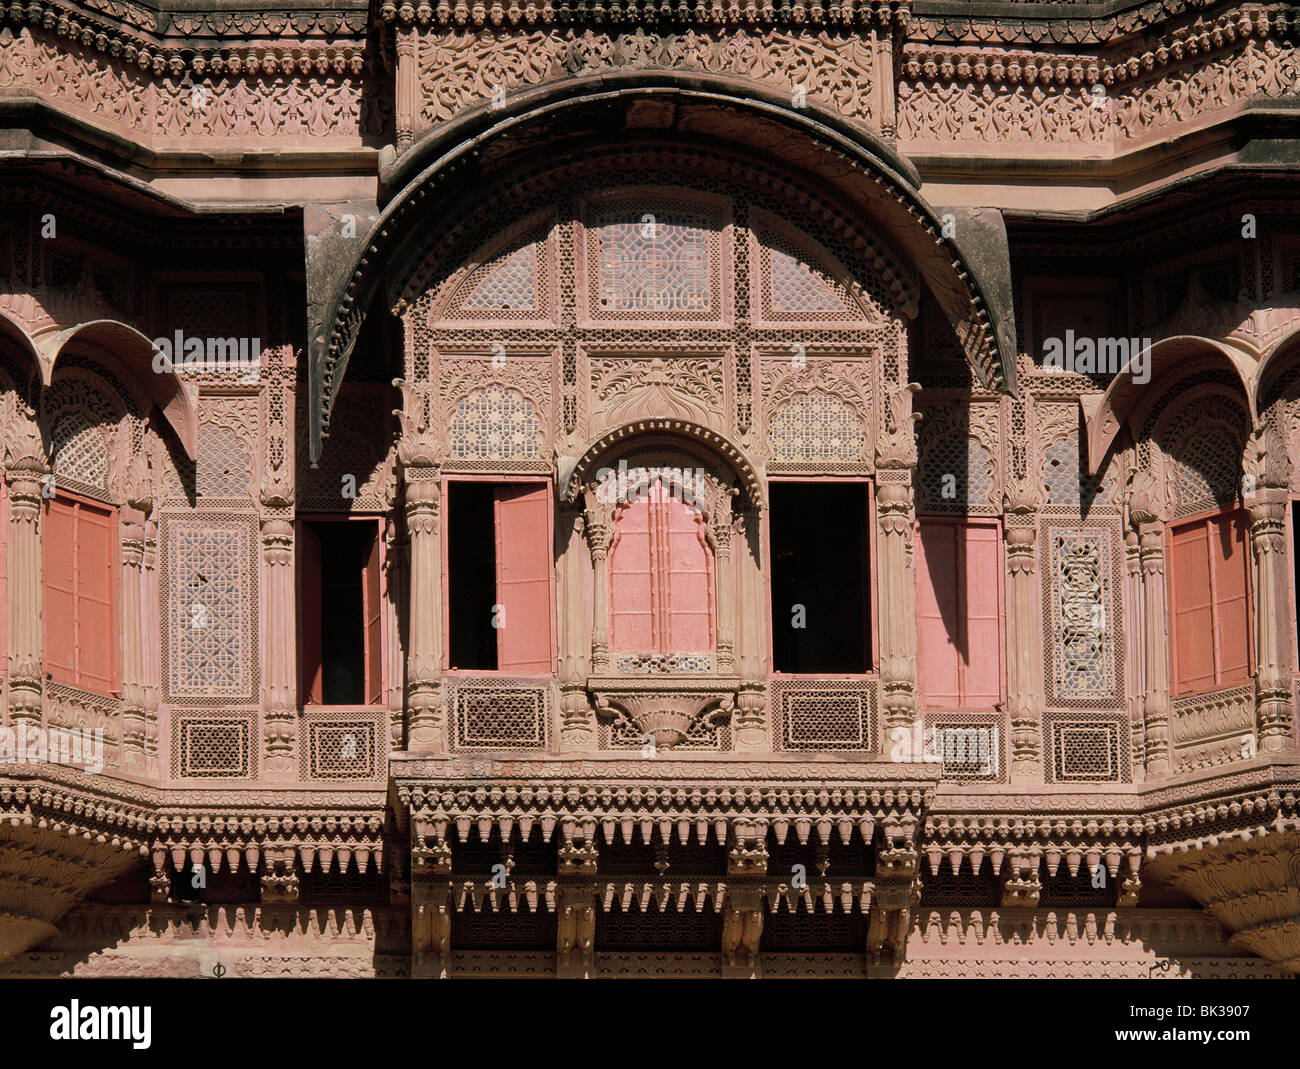 Windows, Jodhpur fort, Rajastán, India, Asia Imagen De Stock